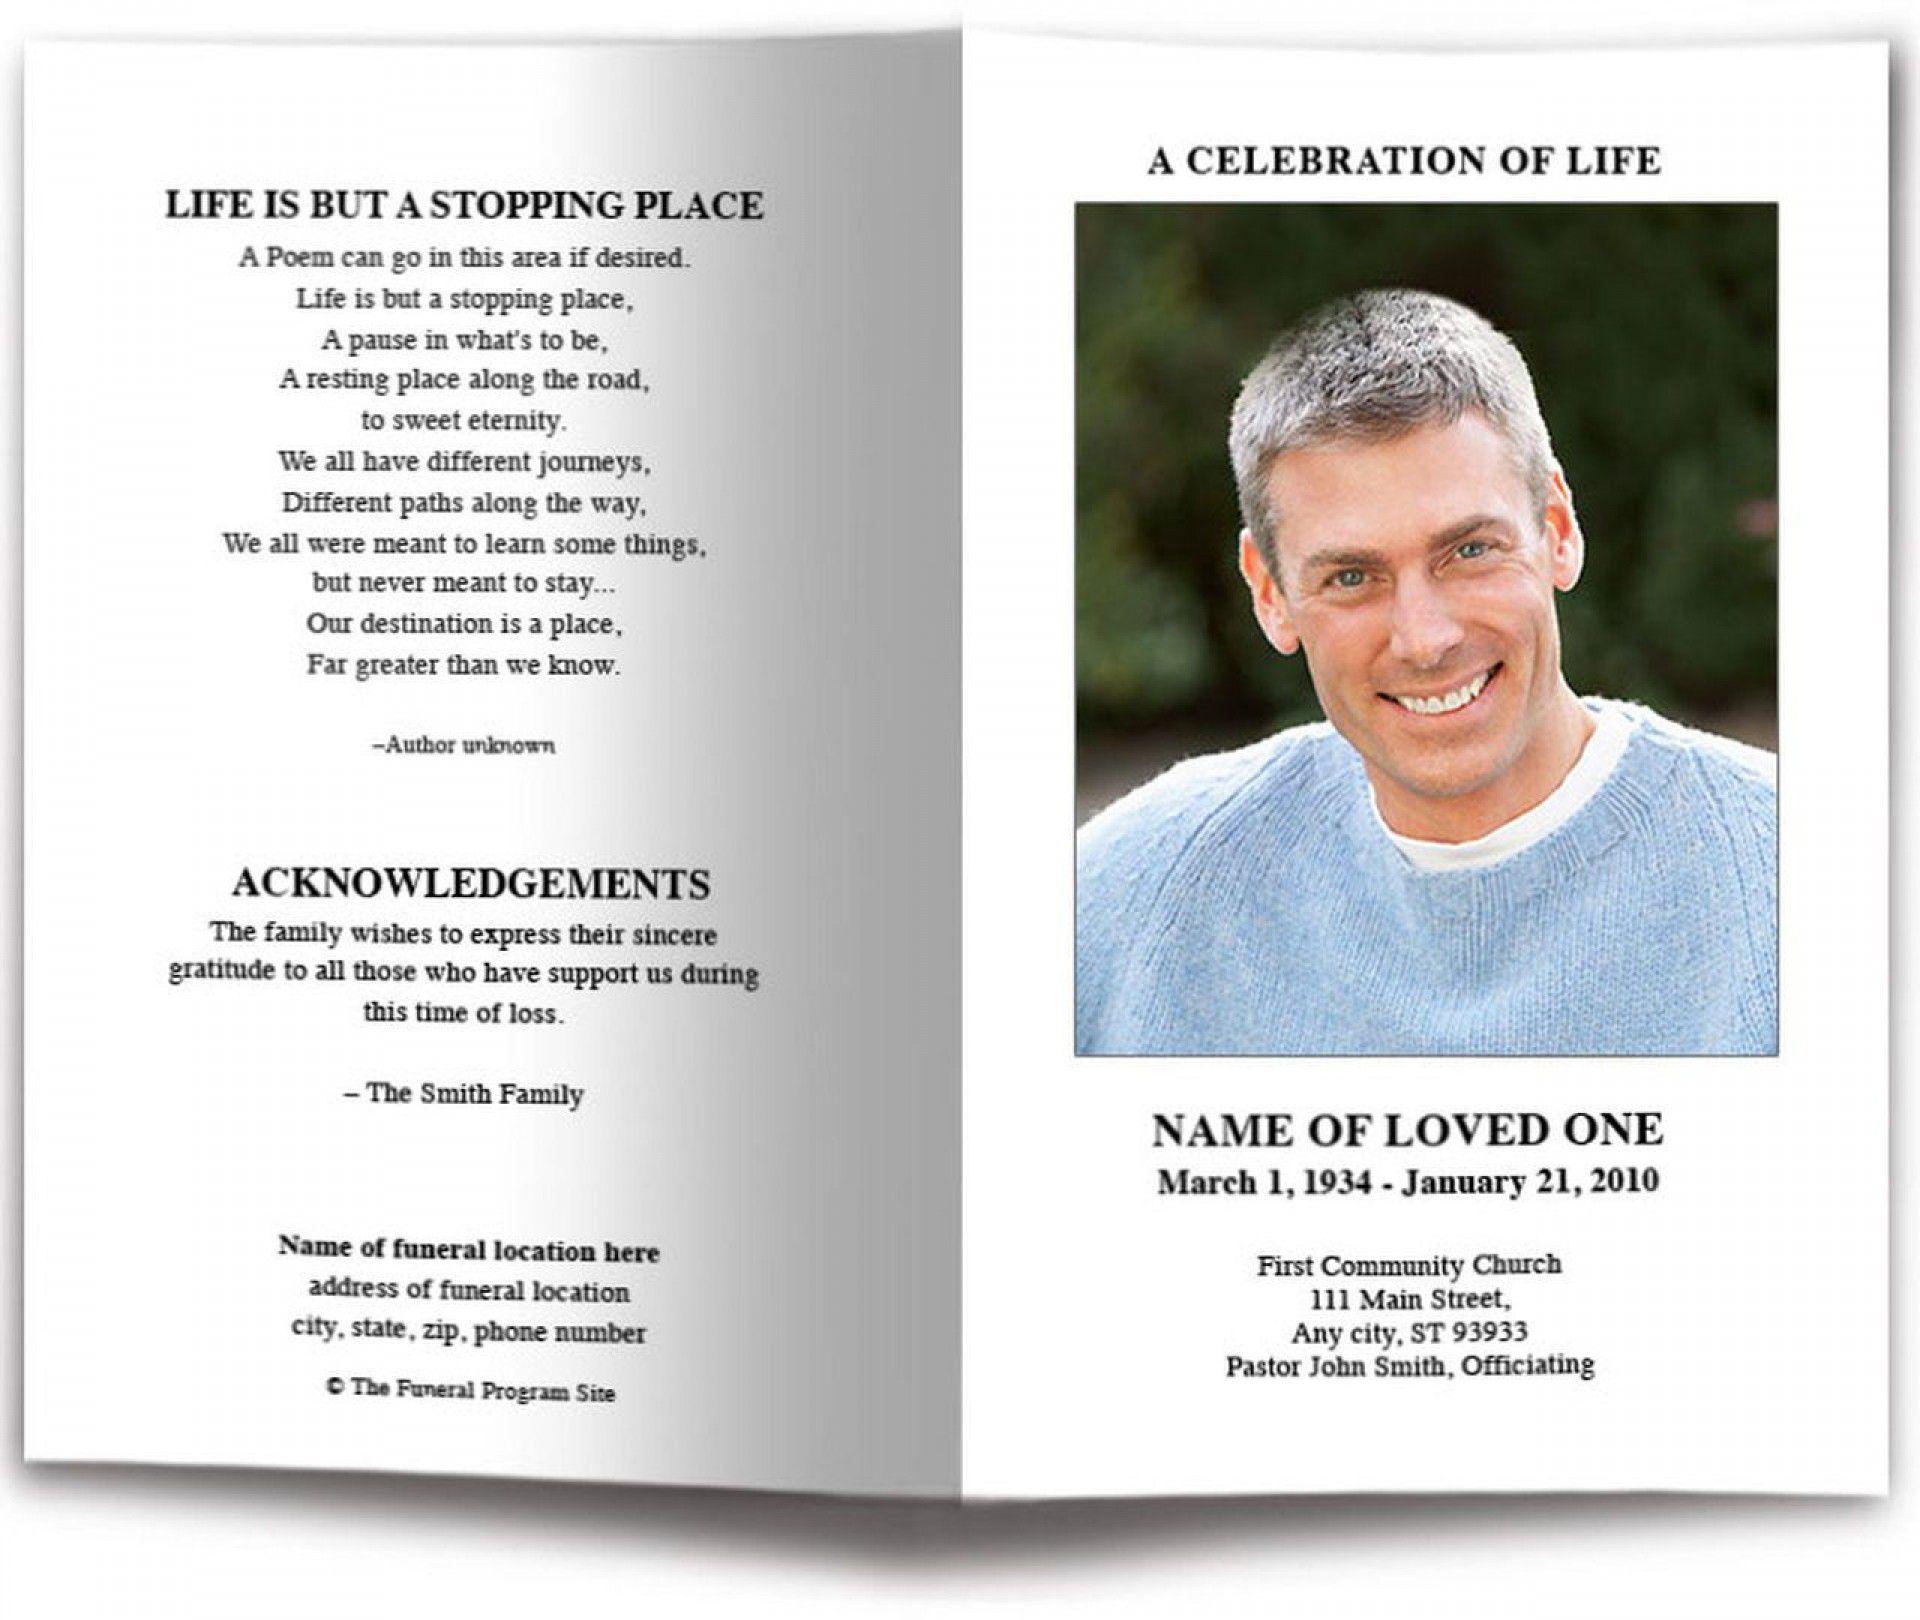 002 Wonderful Funeral Program Template Free High Def  Online Printable Download PublisherFull